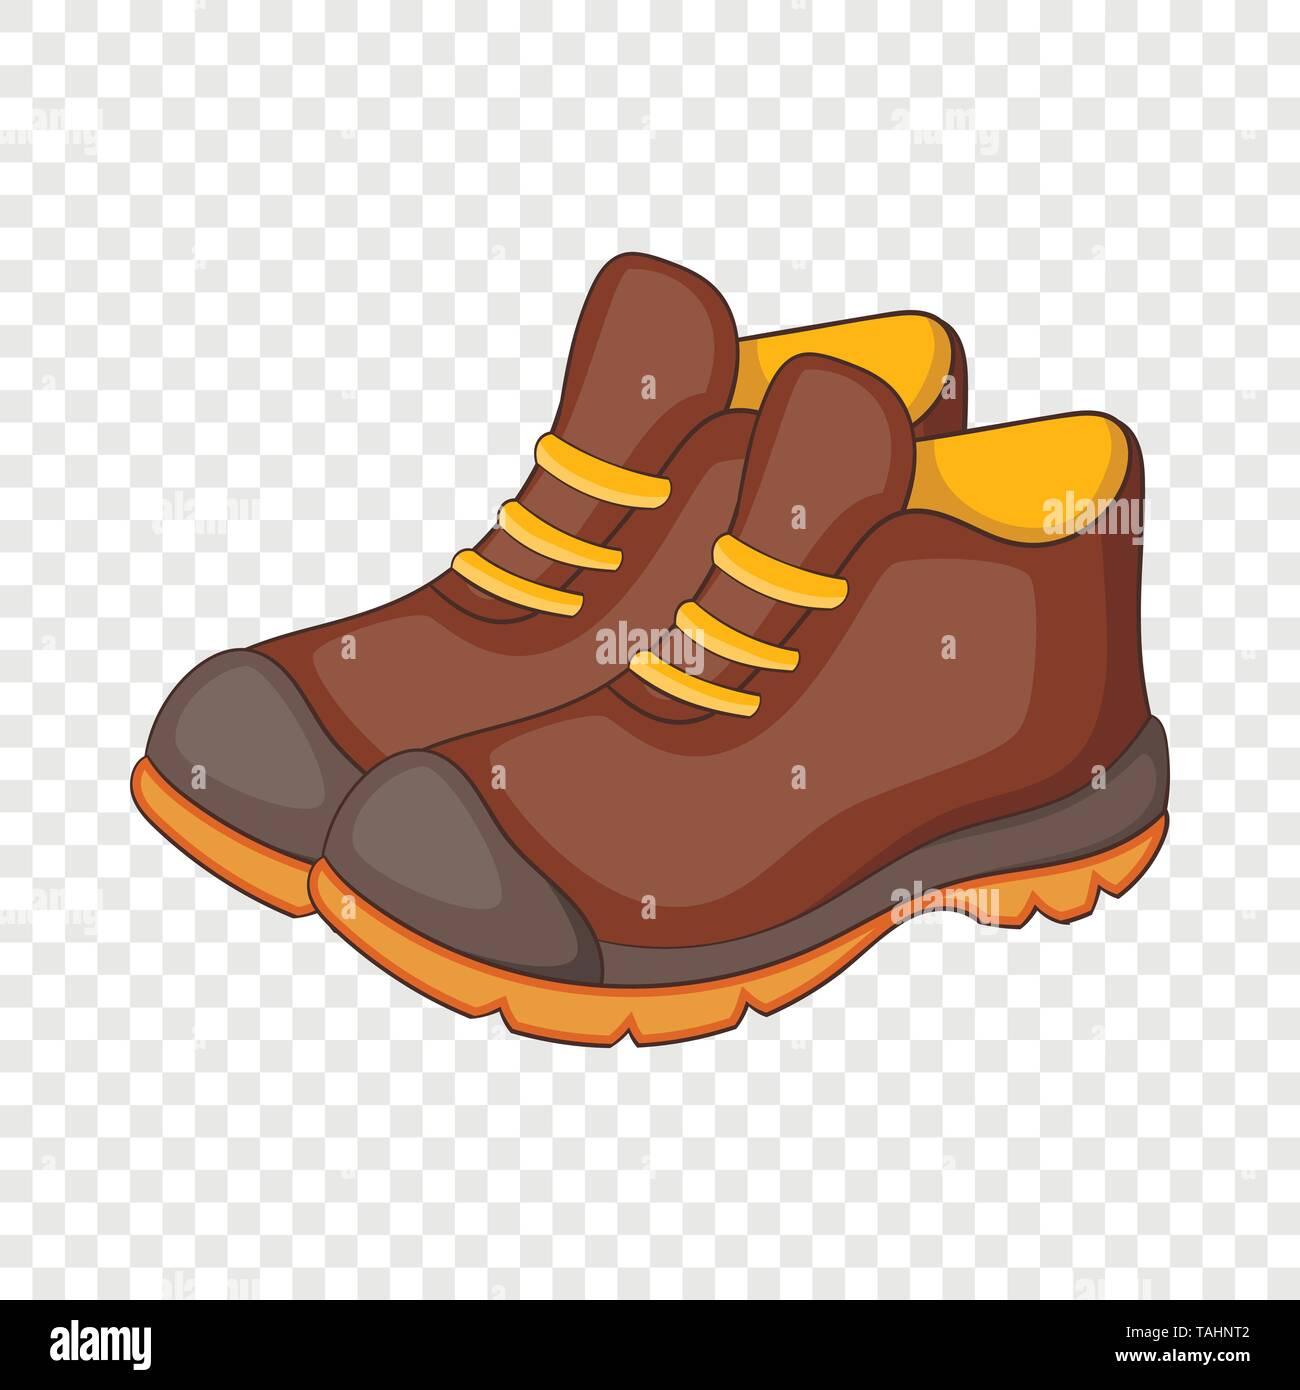 Hiking boots icon, cartoon style - Stock Image